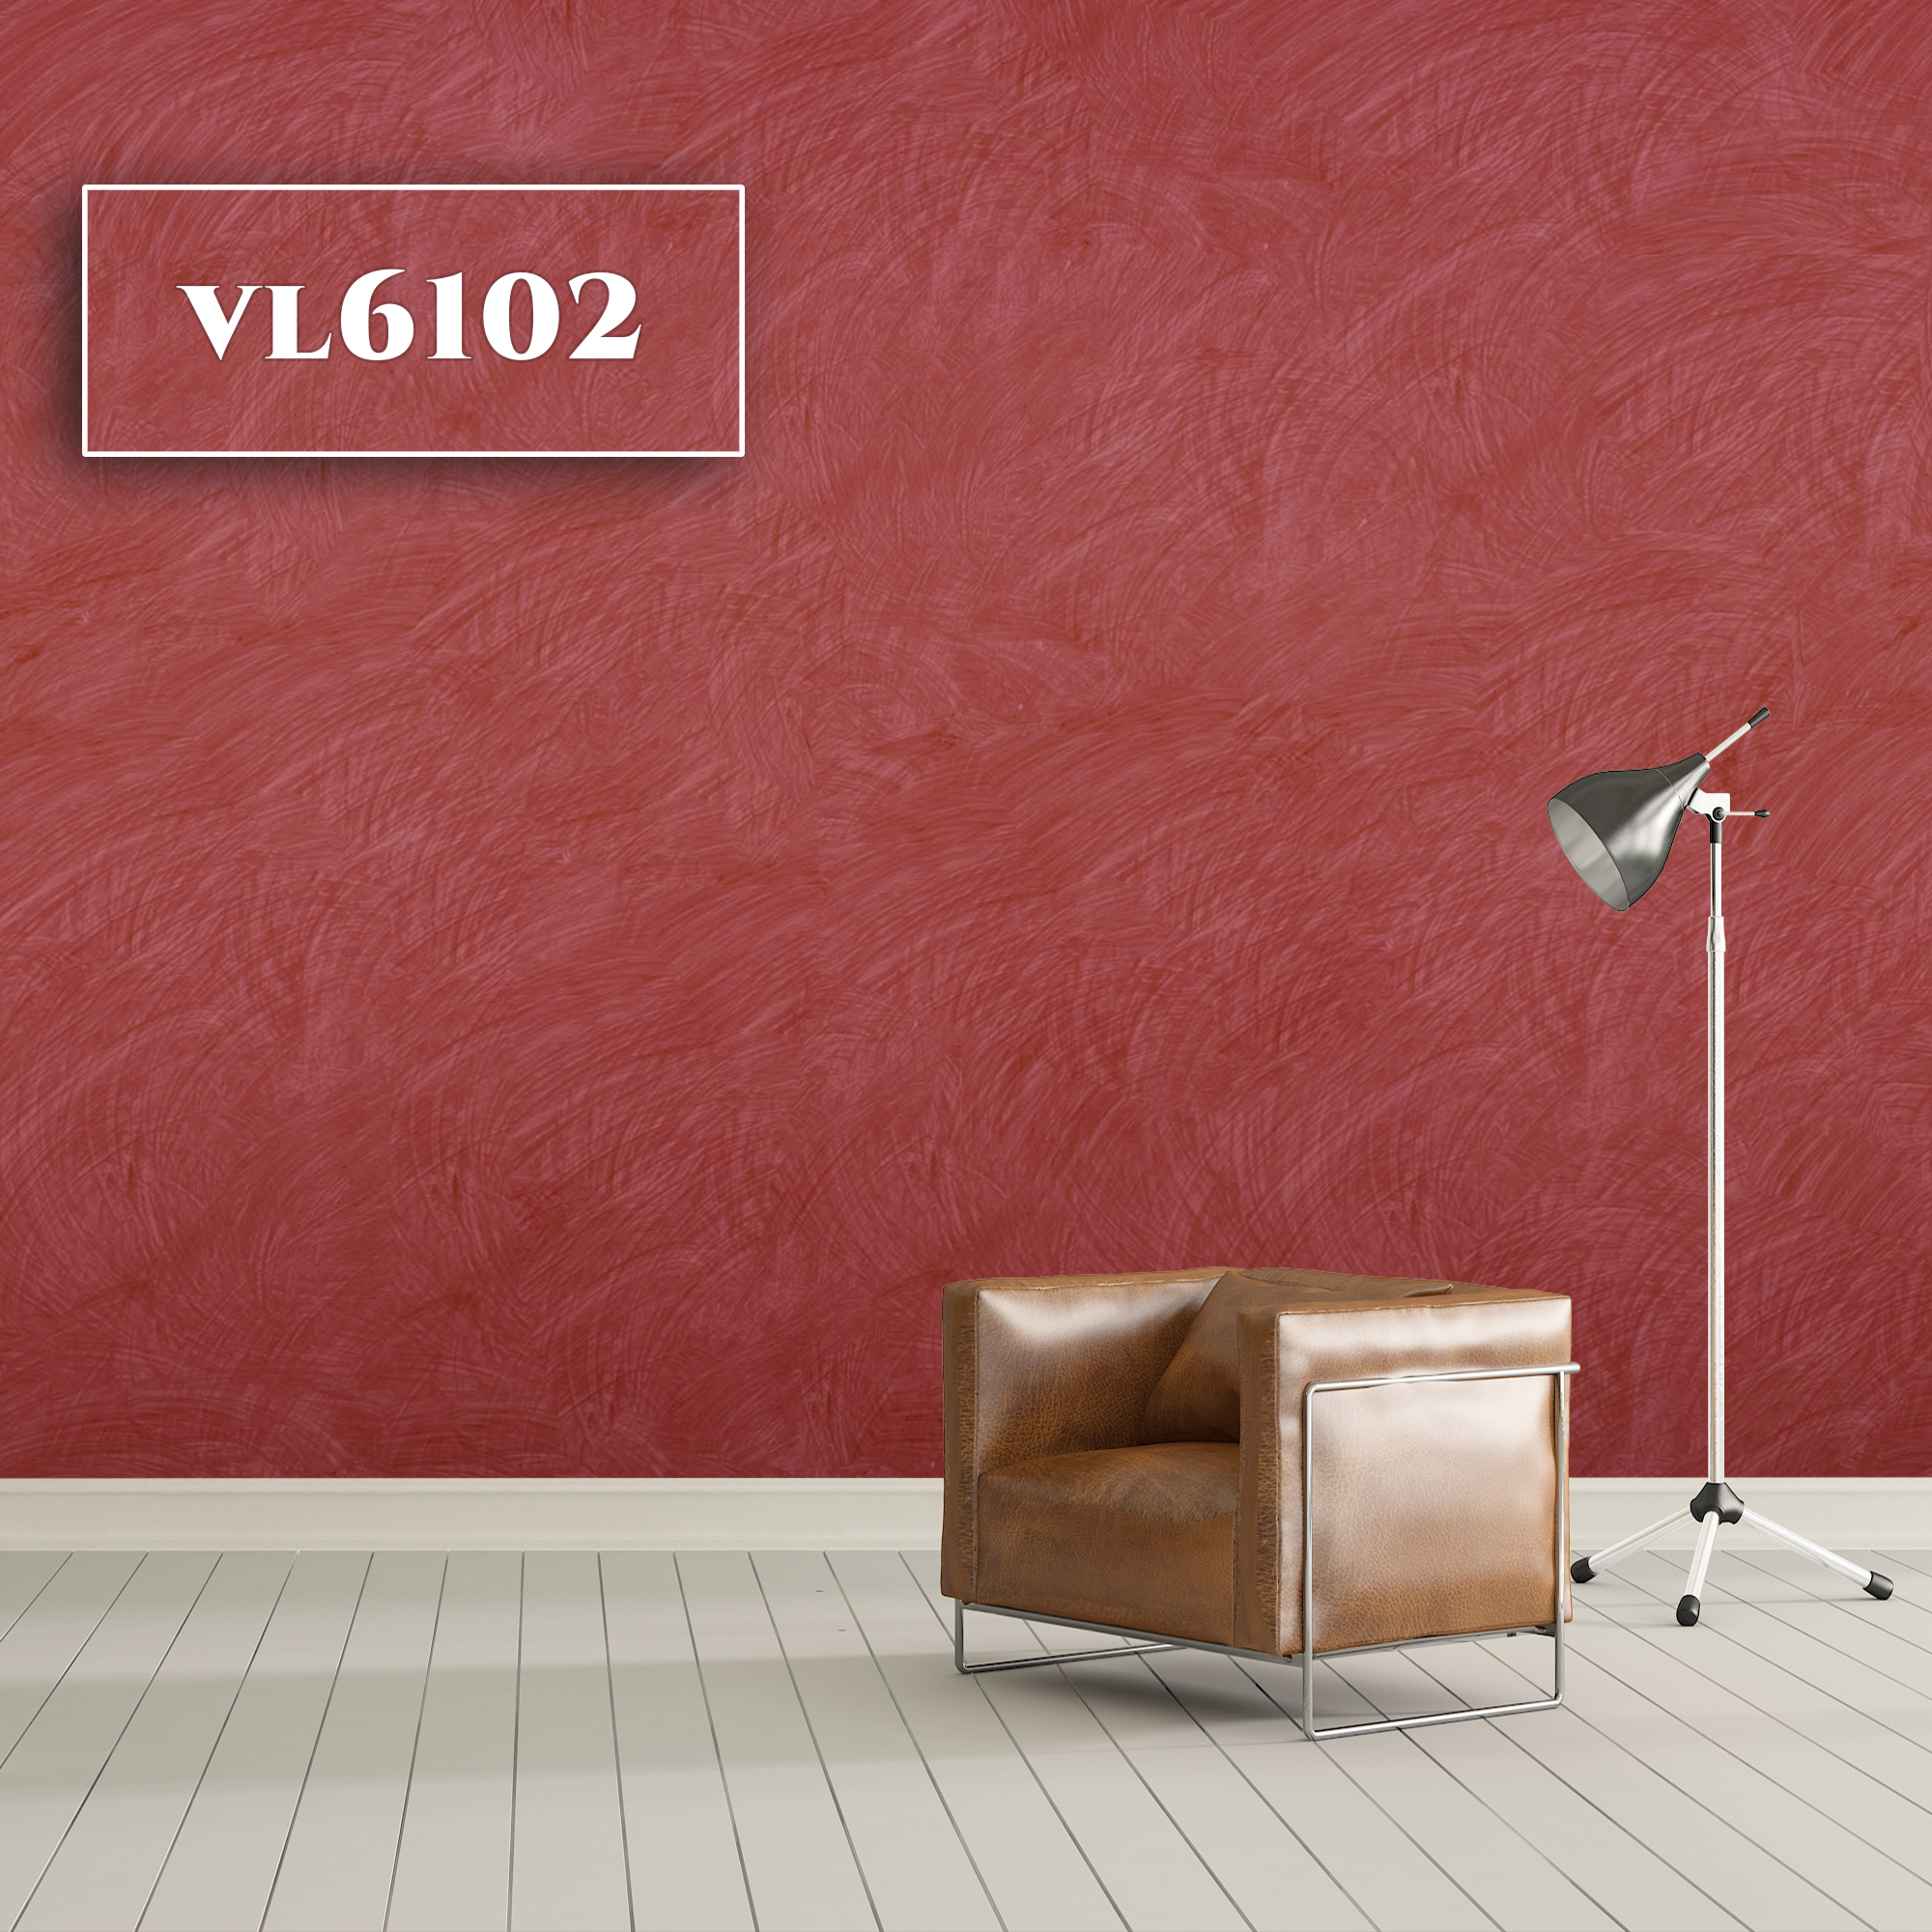 VL6102